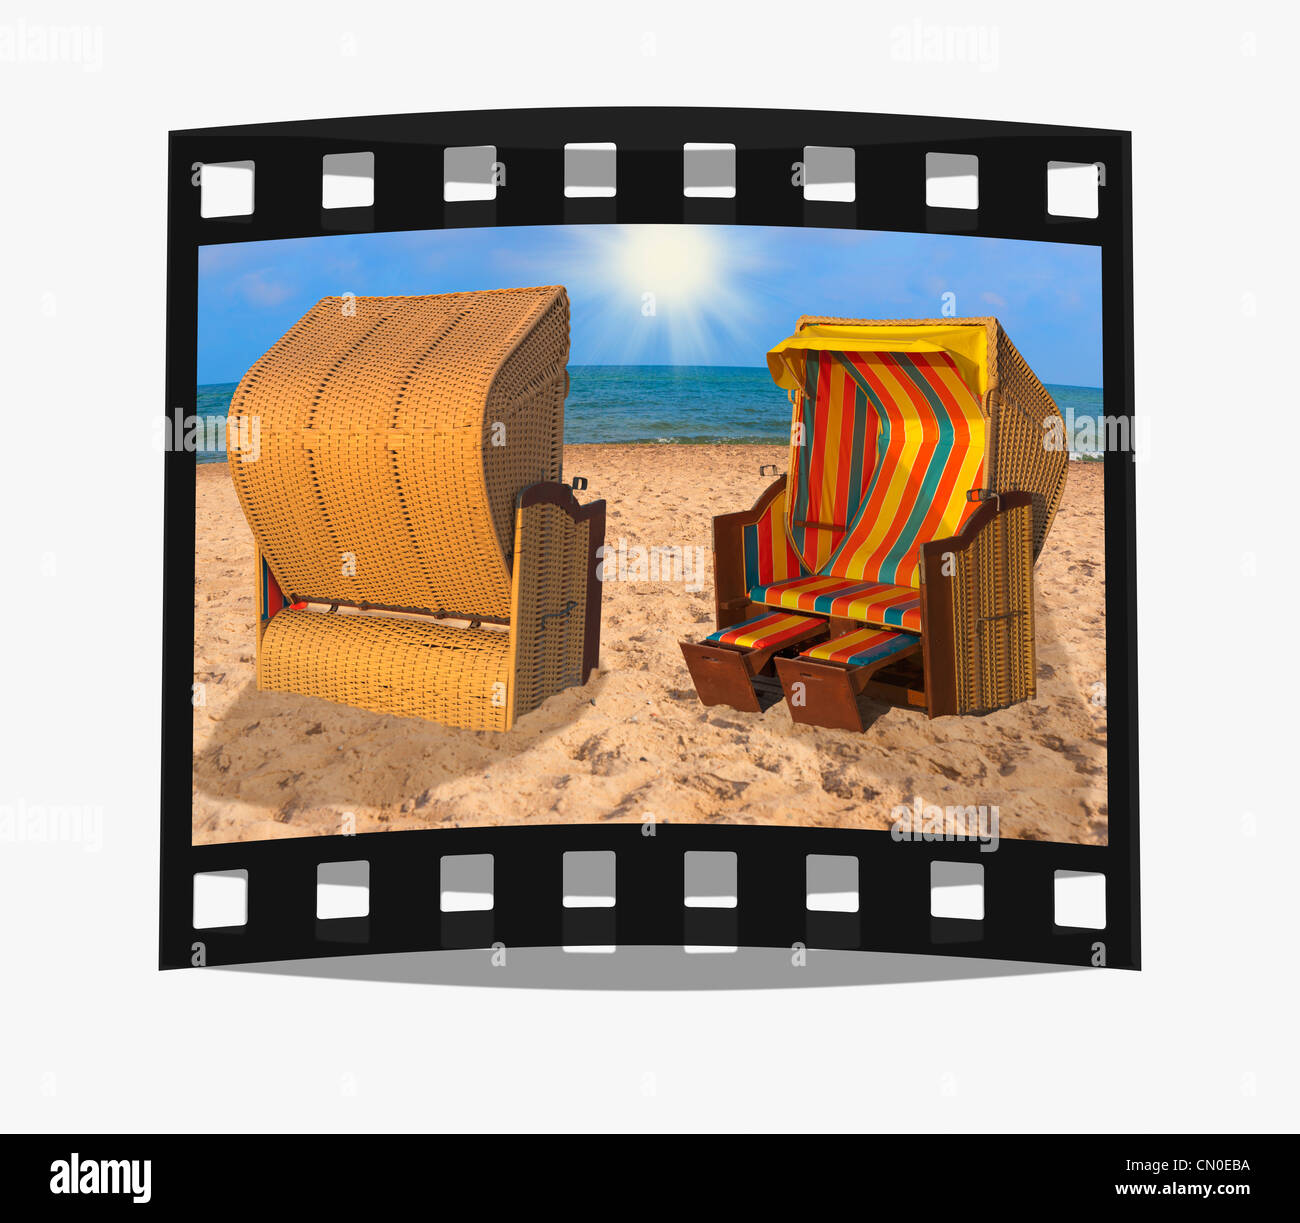 Filmstrip: Baltic Sea Mecklenburg Western Pomerania Germany Europe - Stock Image